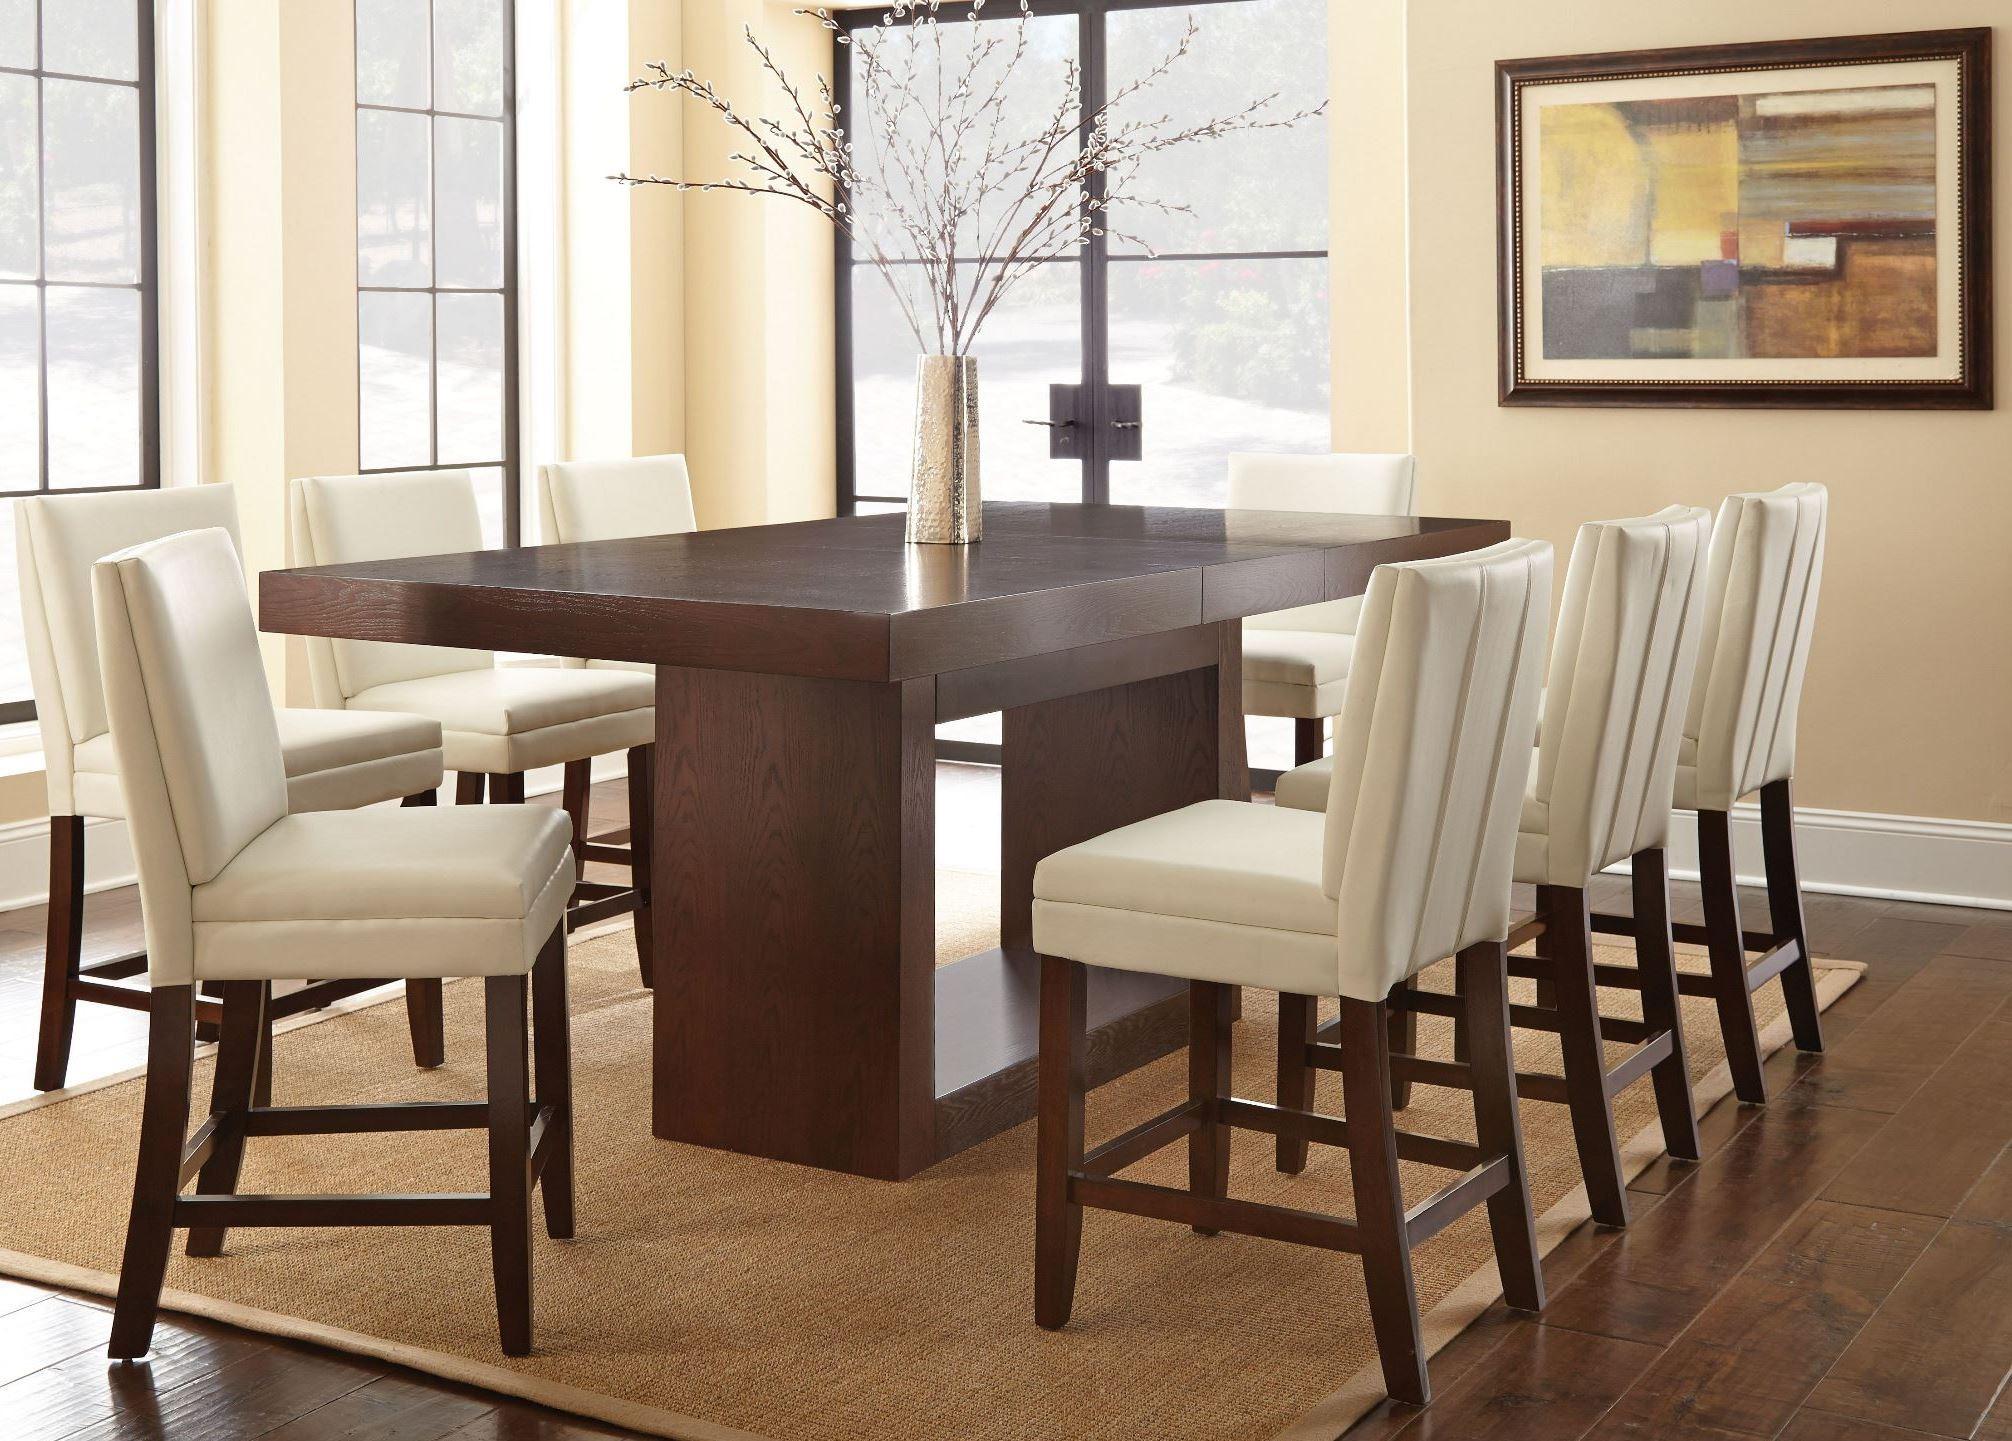 Counter Height Rectangular Dining Set : Antonio Extendable Rectangular Counter Height Dining Room Set from ...